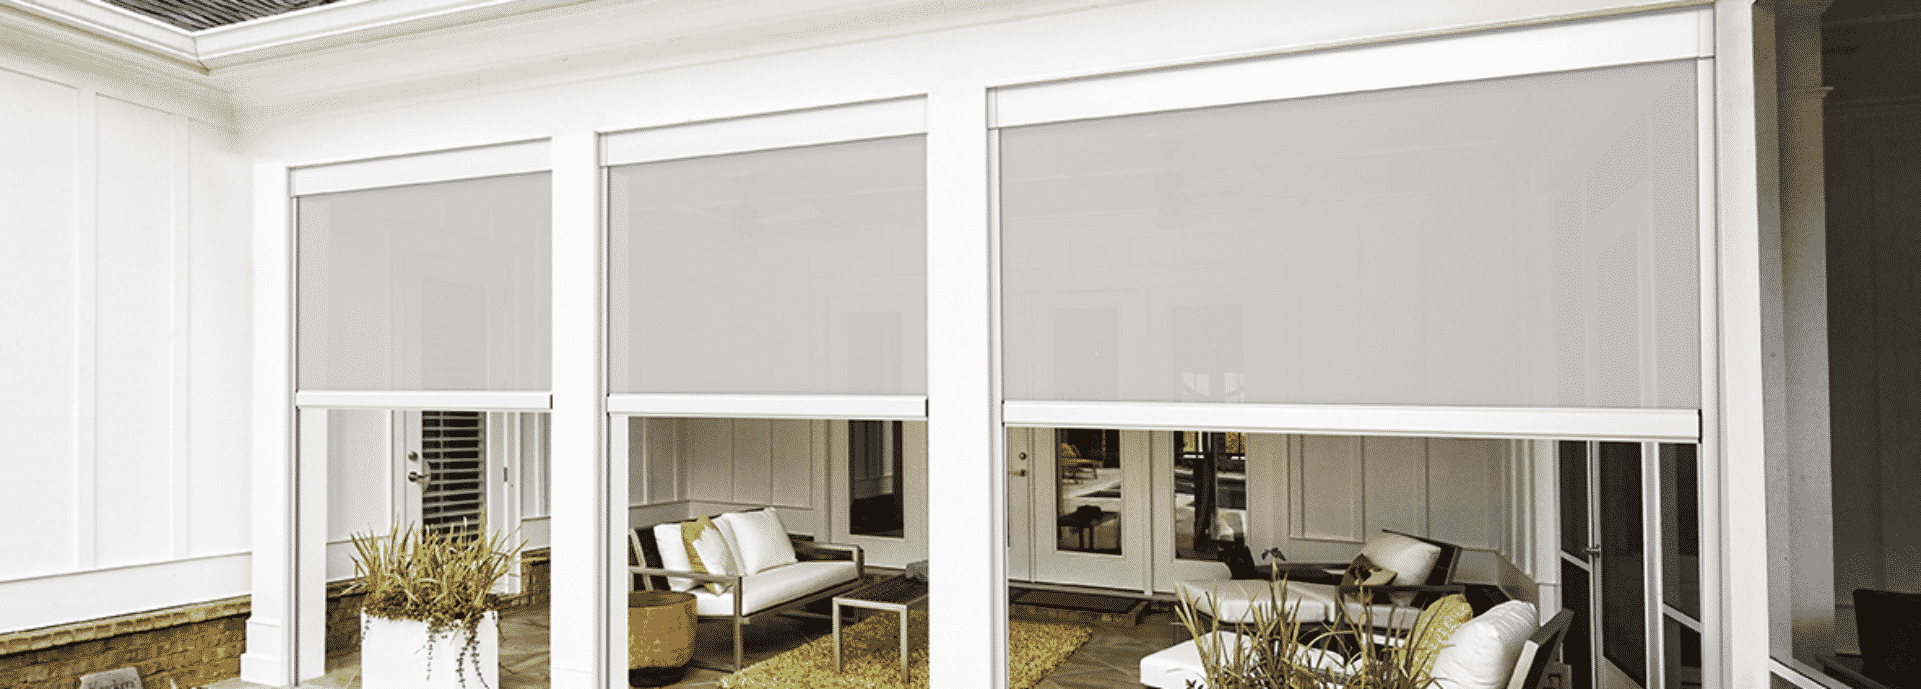 Zipscreen Outdoorshades Outdoorroom